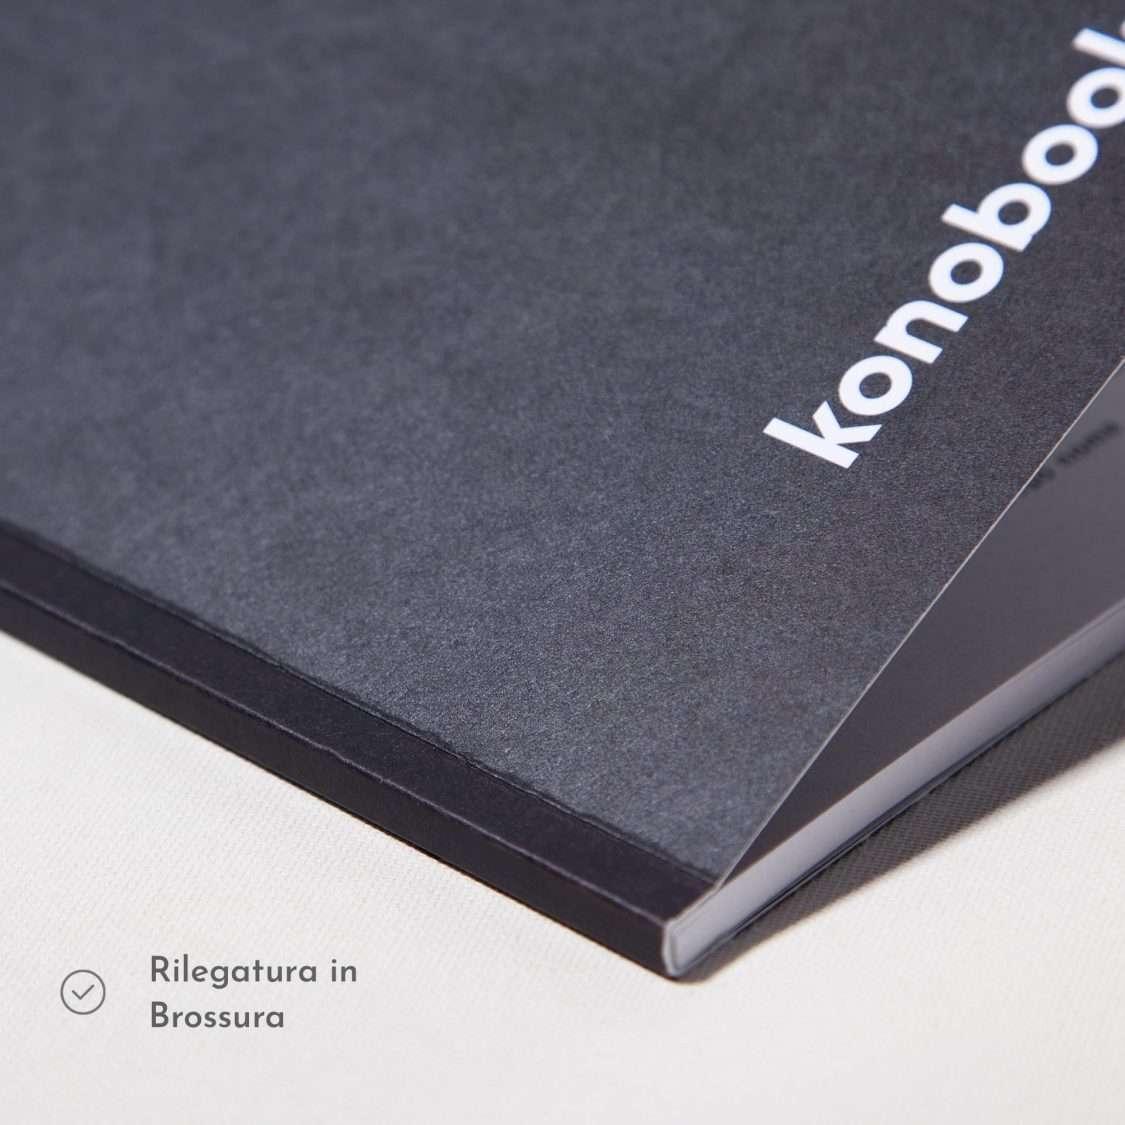 Quaderno nero rilegato in brossura Konobooks